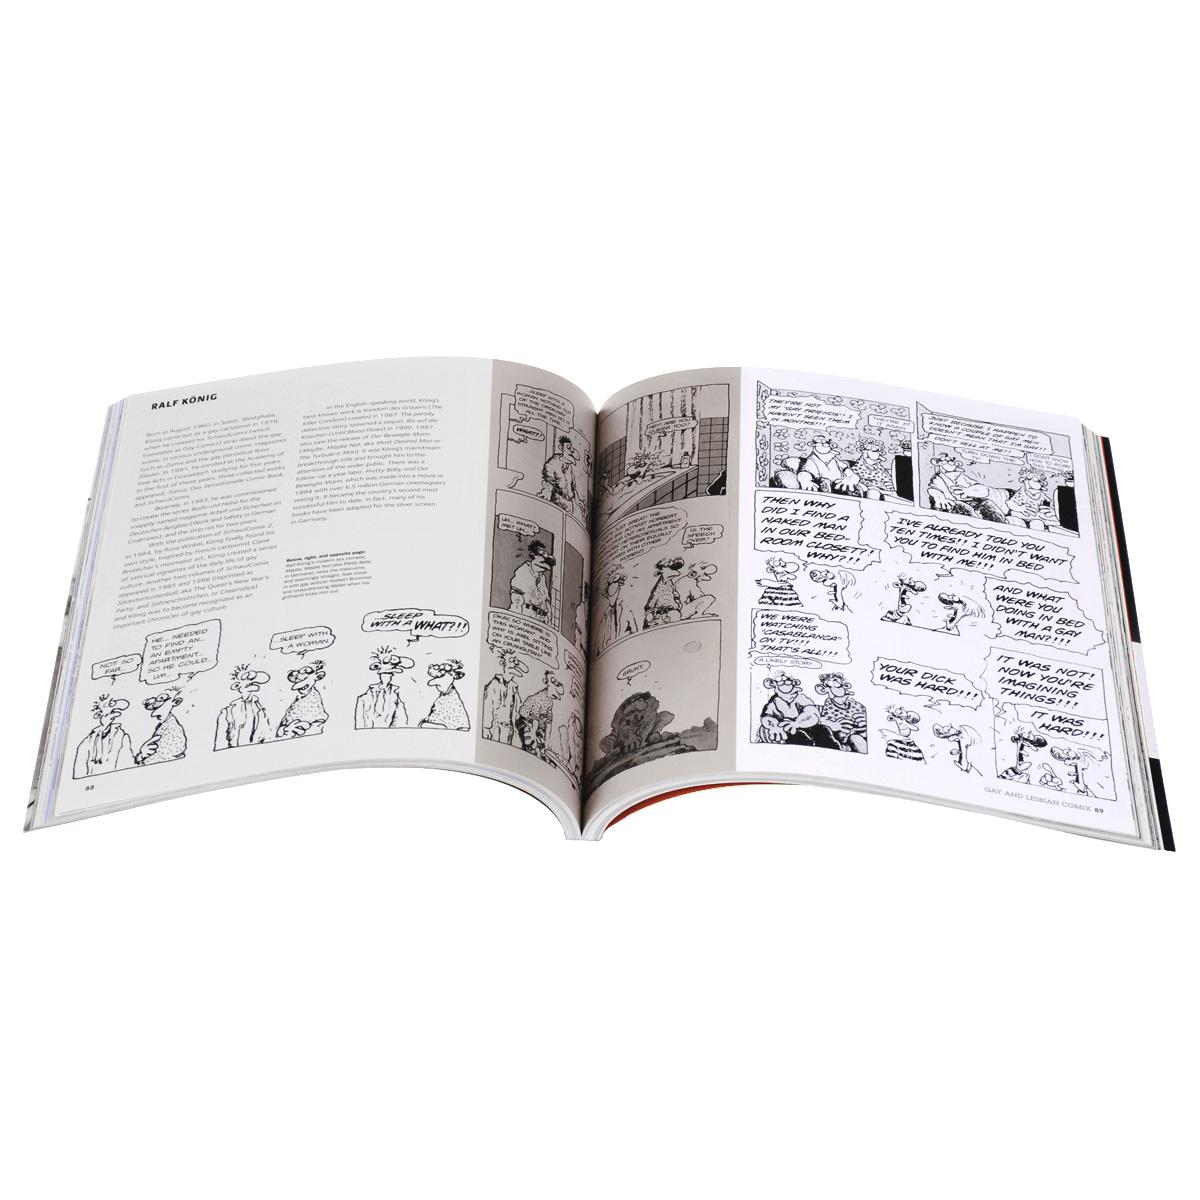 Erotic Comics: A Graphic History: Volume 2